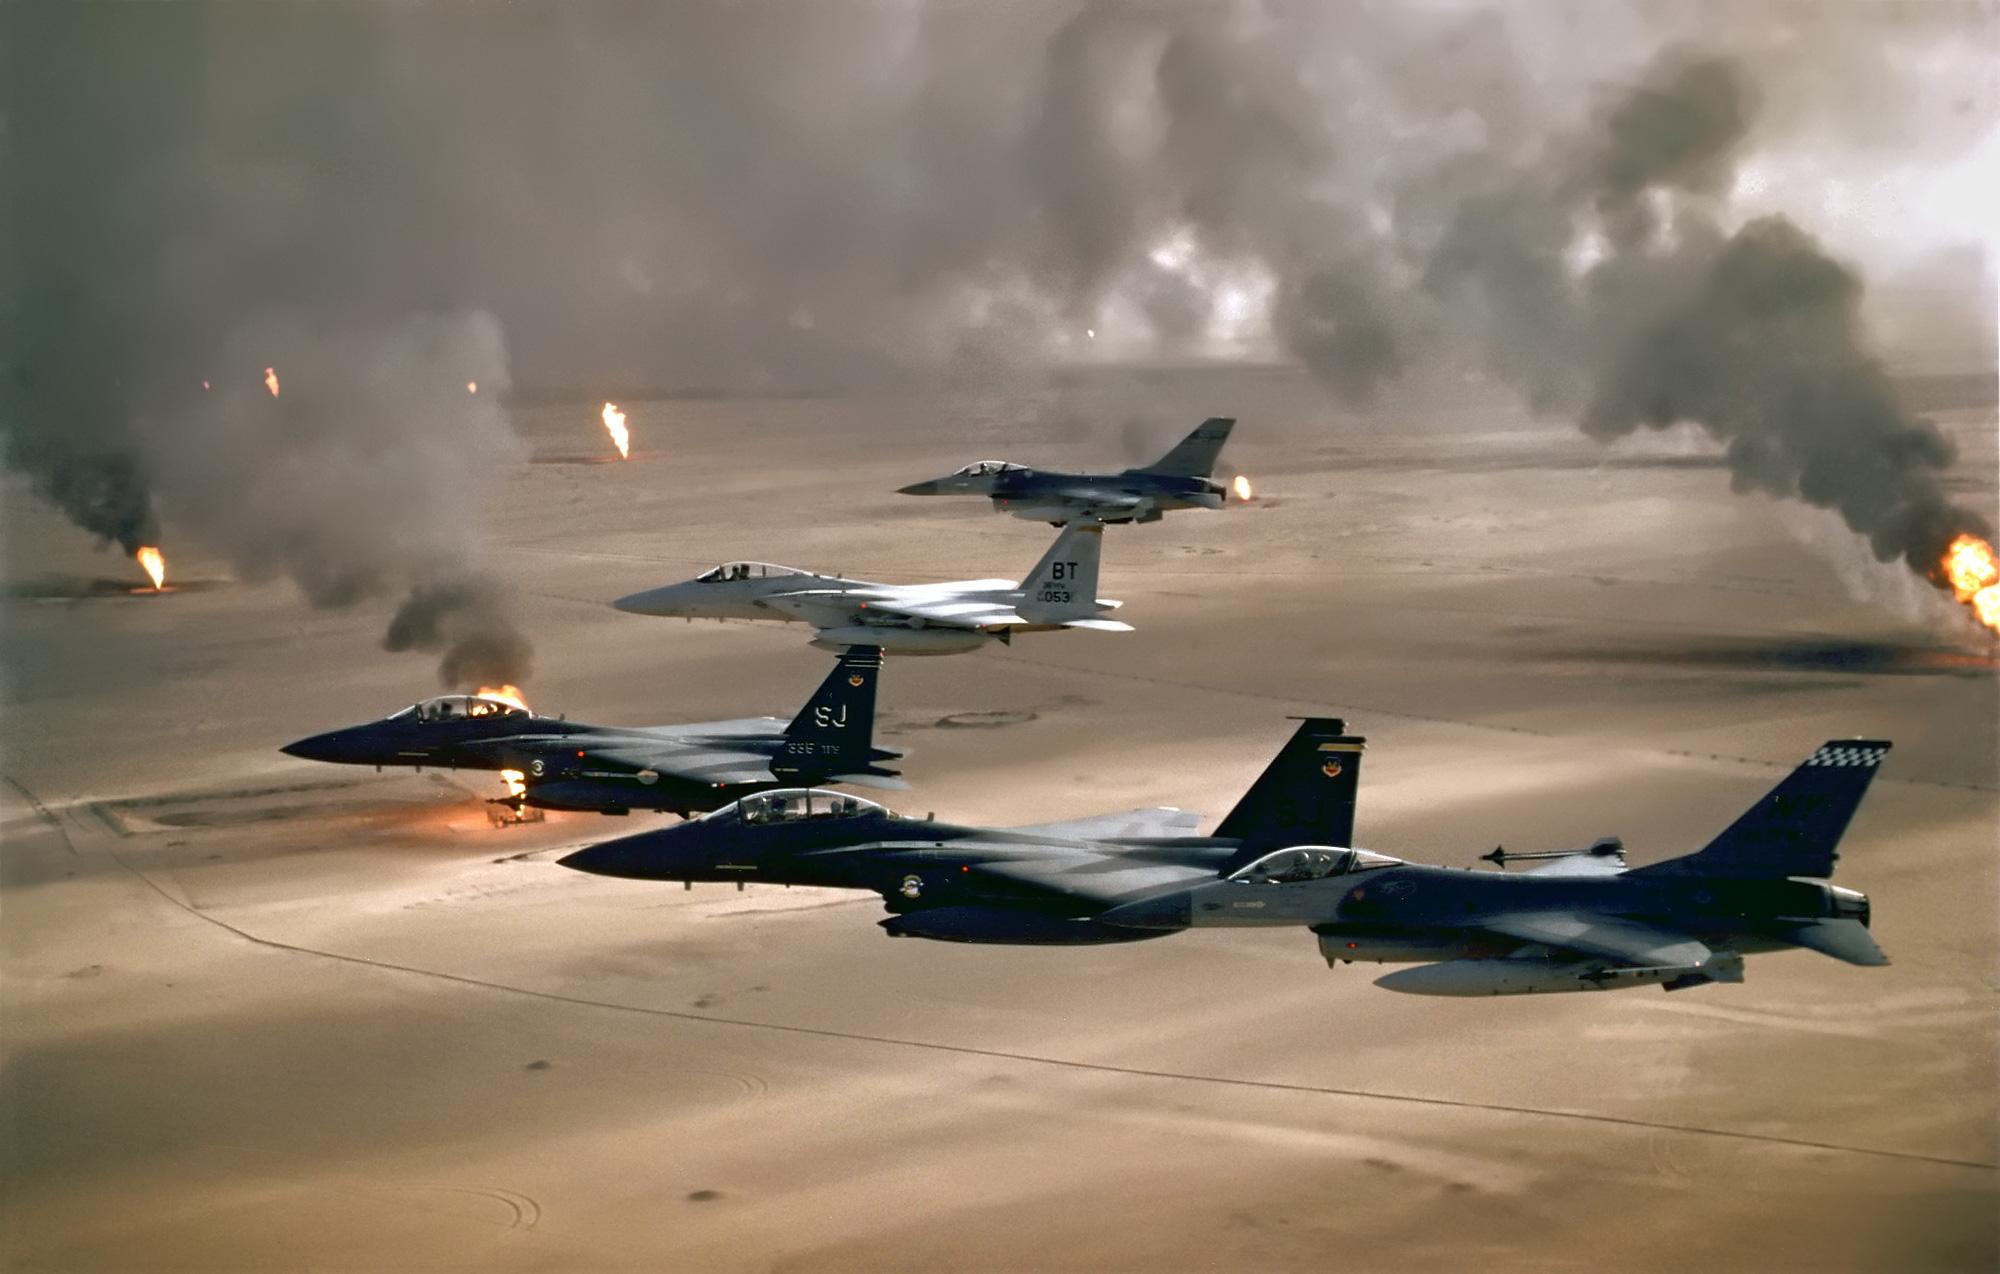 Aeronaves americanas sobrevoando regiões bombardeadas do Kuwait